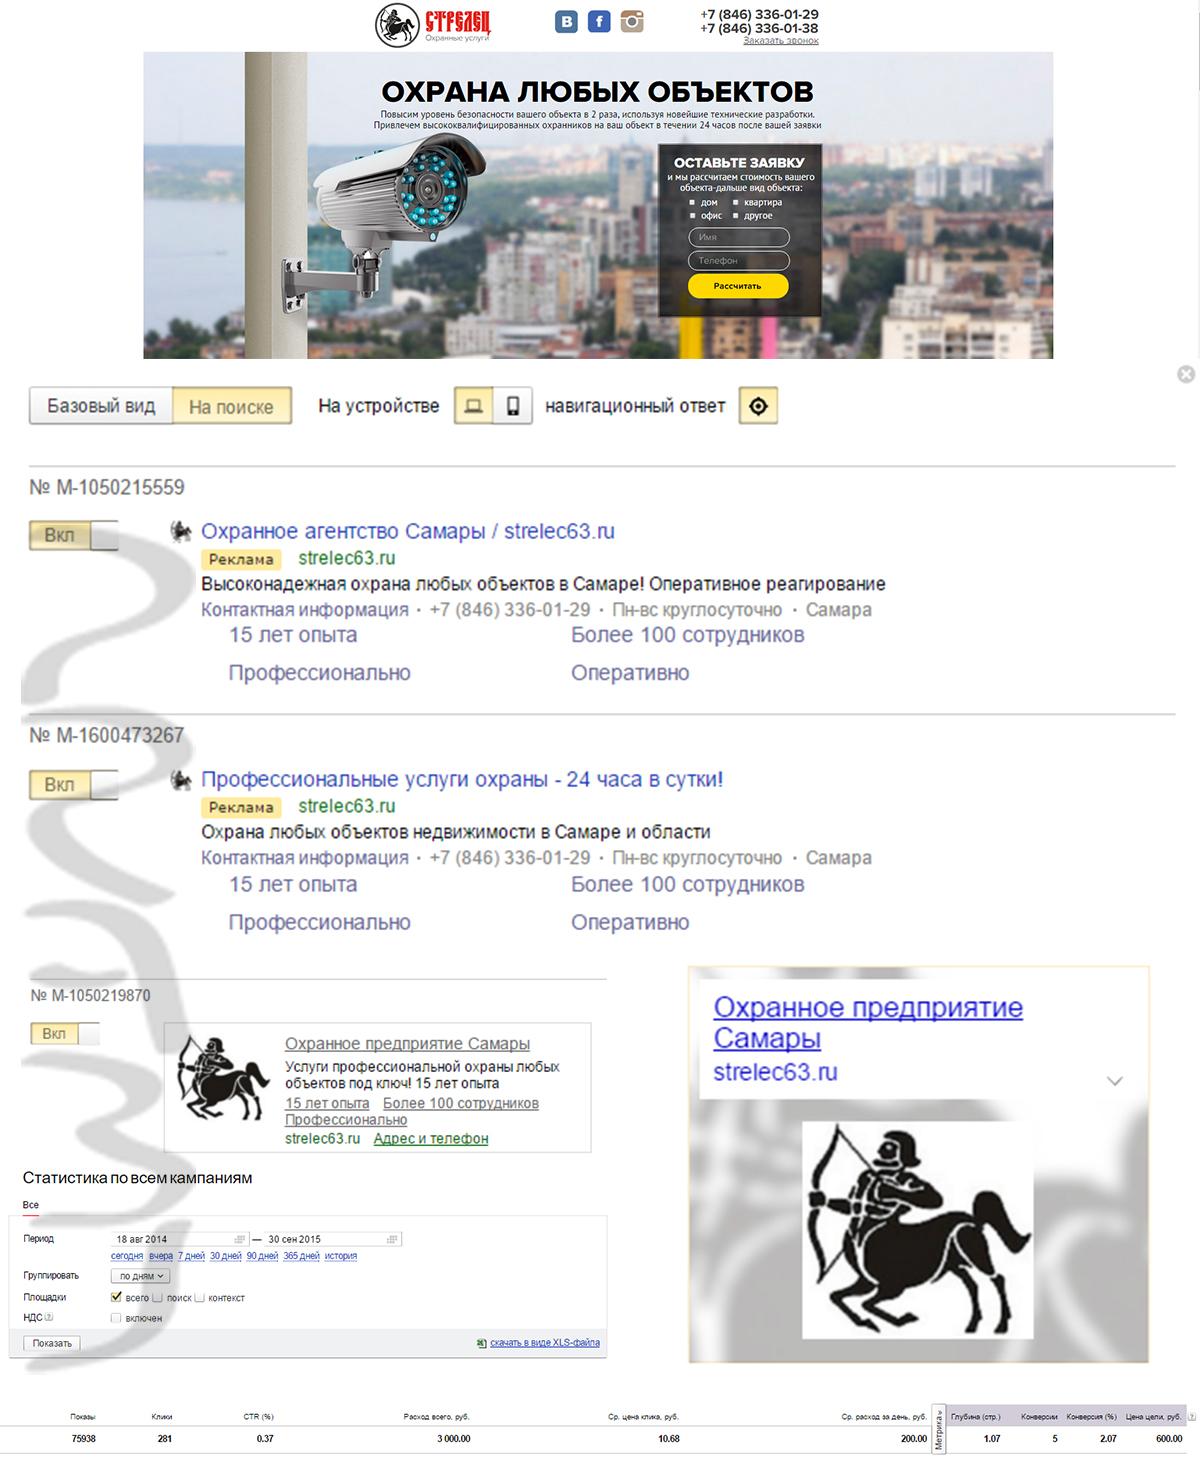 Яндекс Директ | Самара | Услуги охраны (охранное агентство) | Услуги